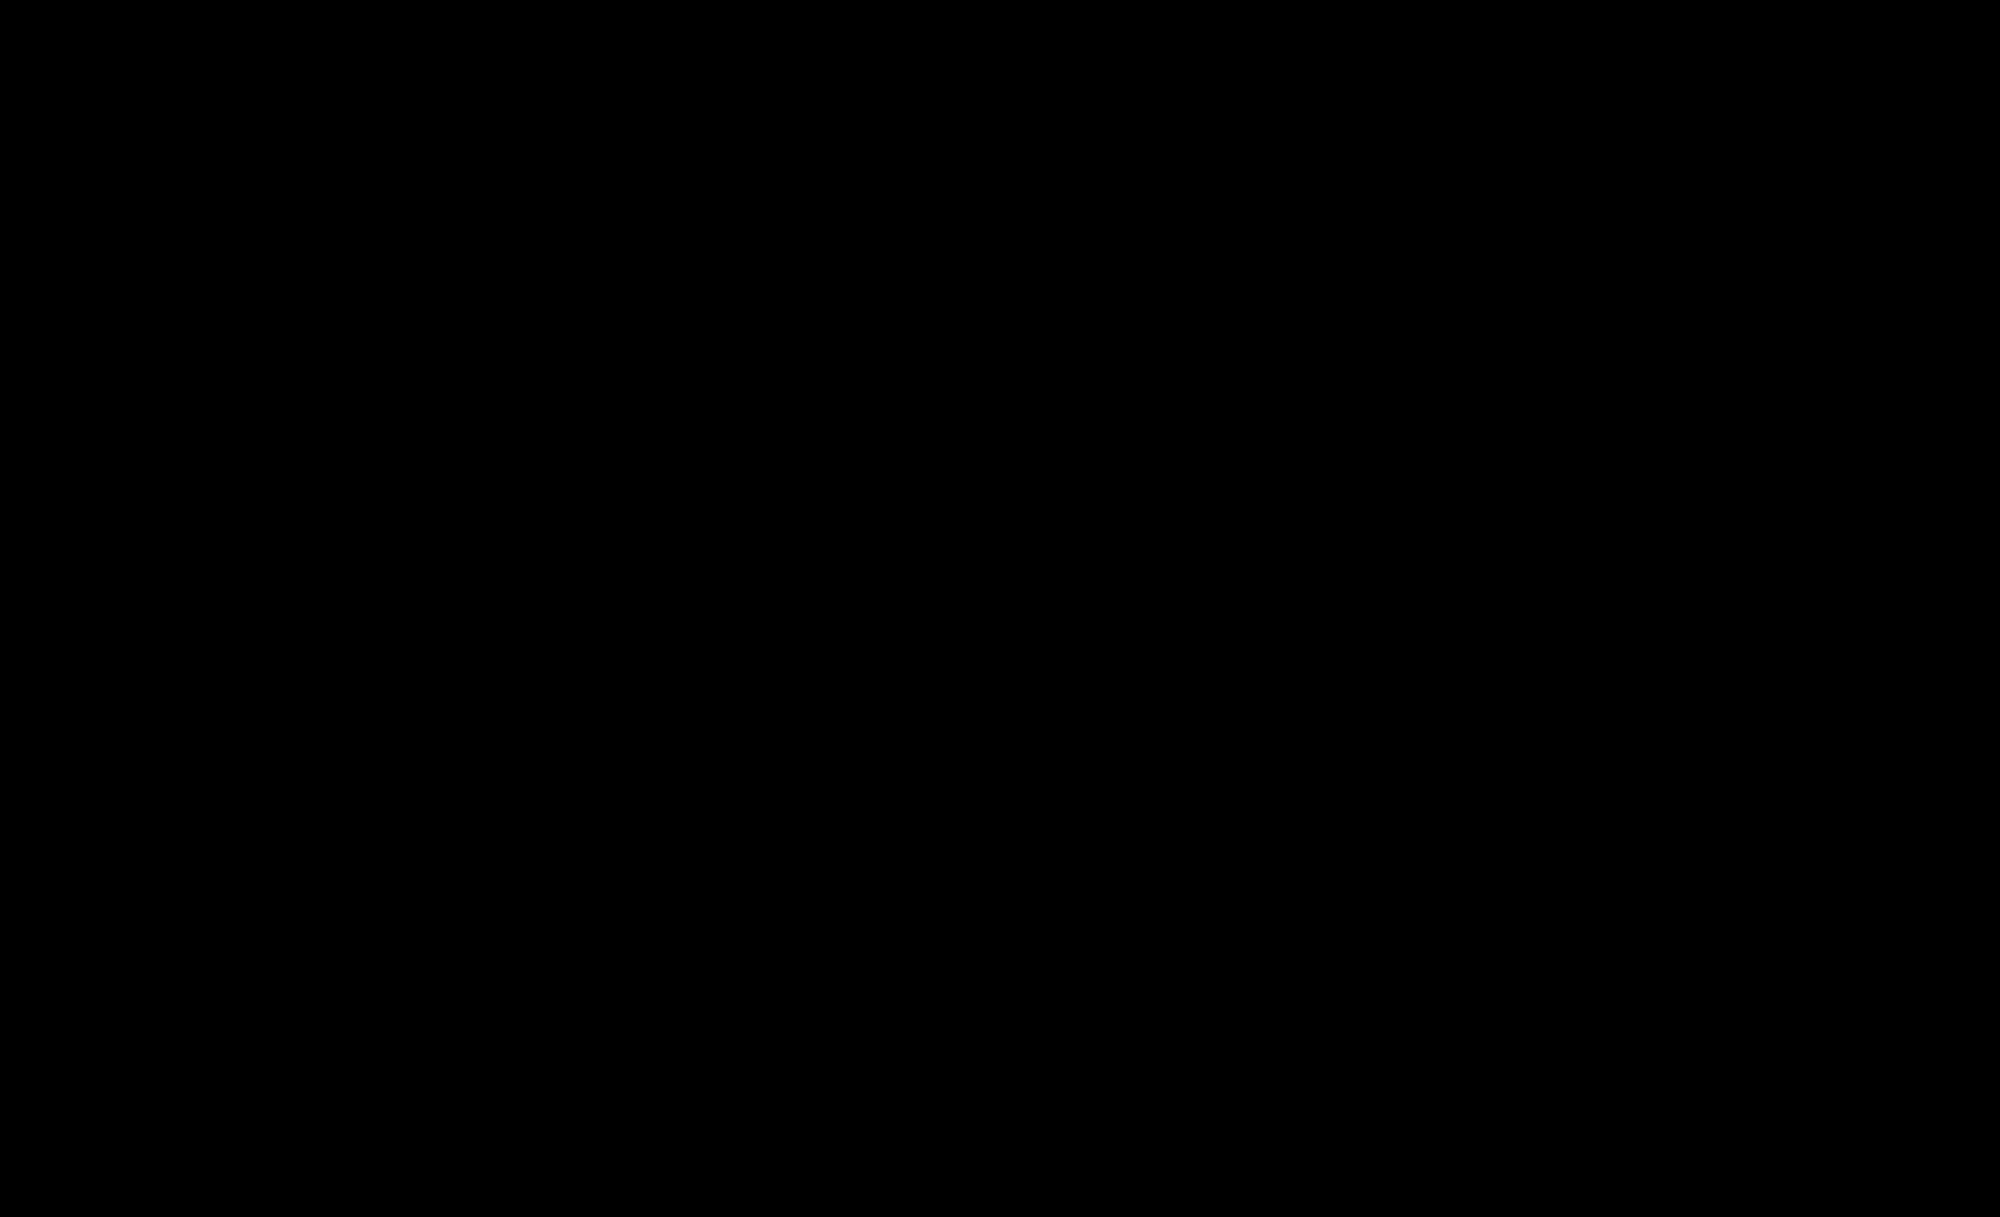 3d00fc18-99e6-42ad-aa38-70bc11136873.png